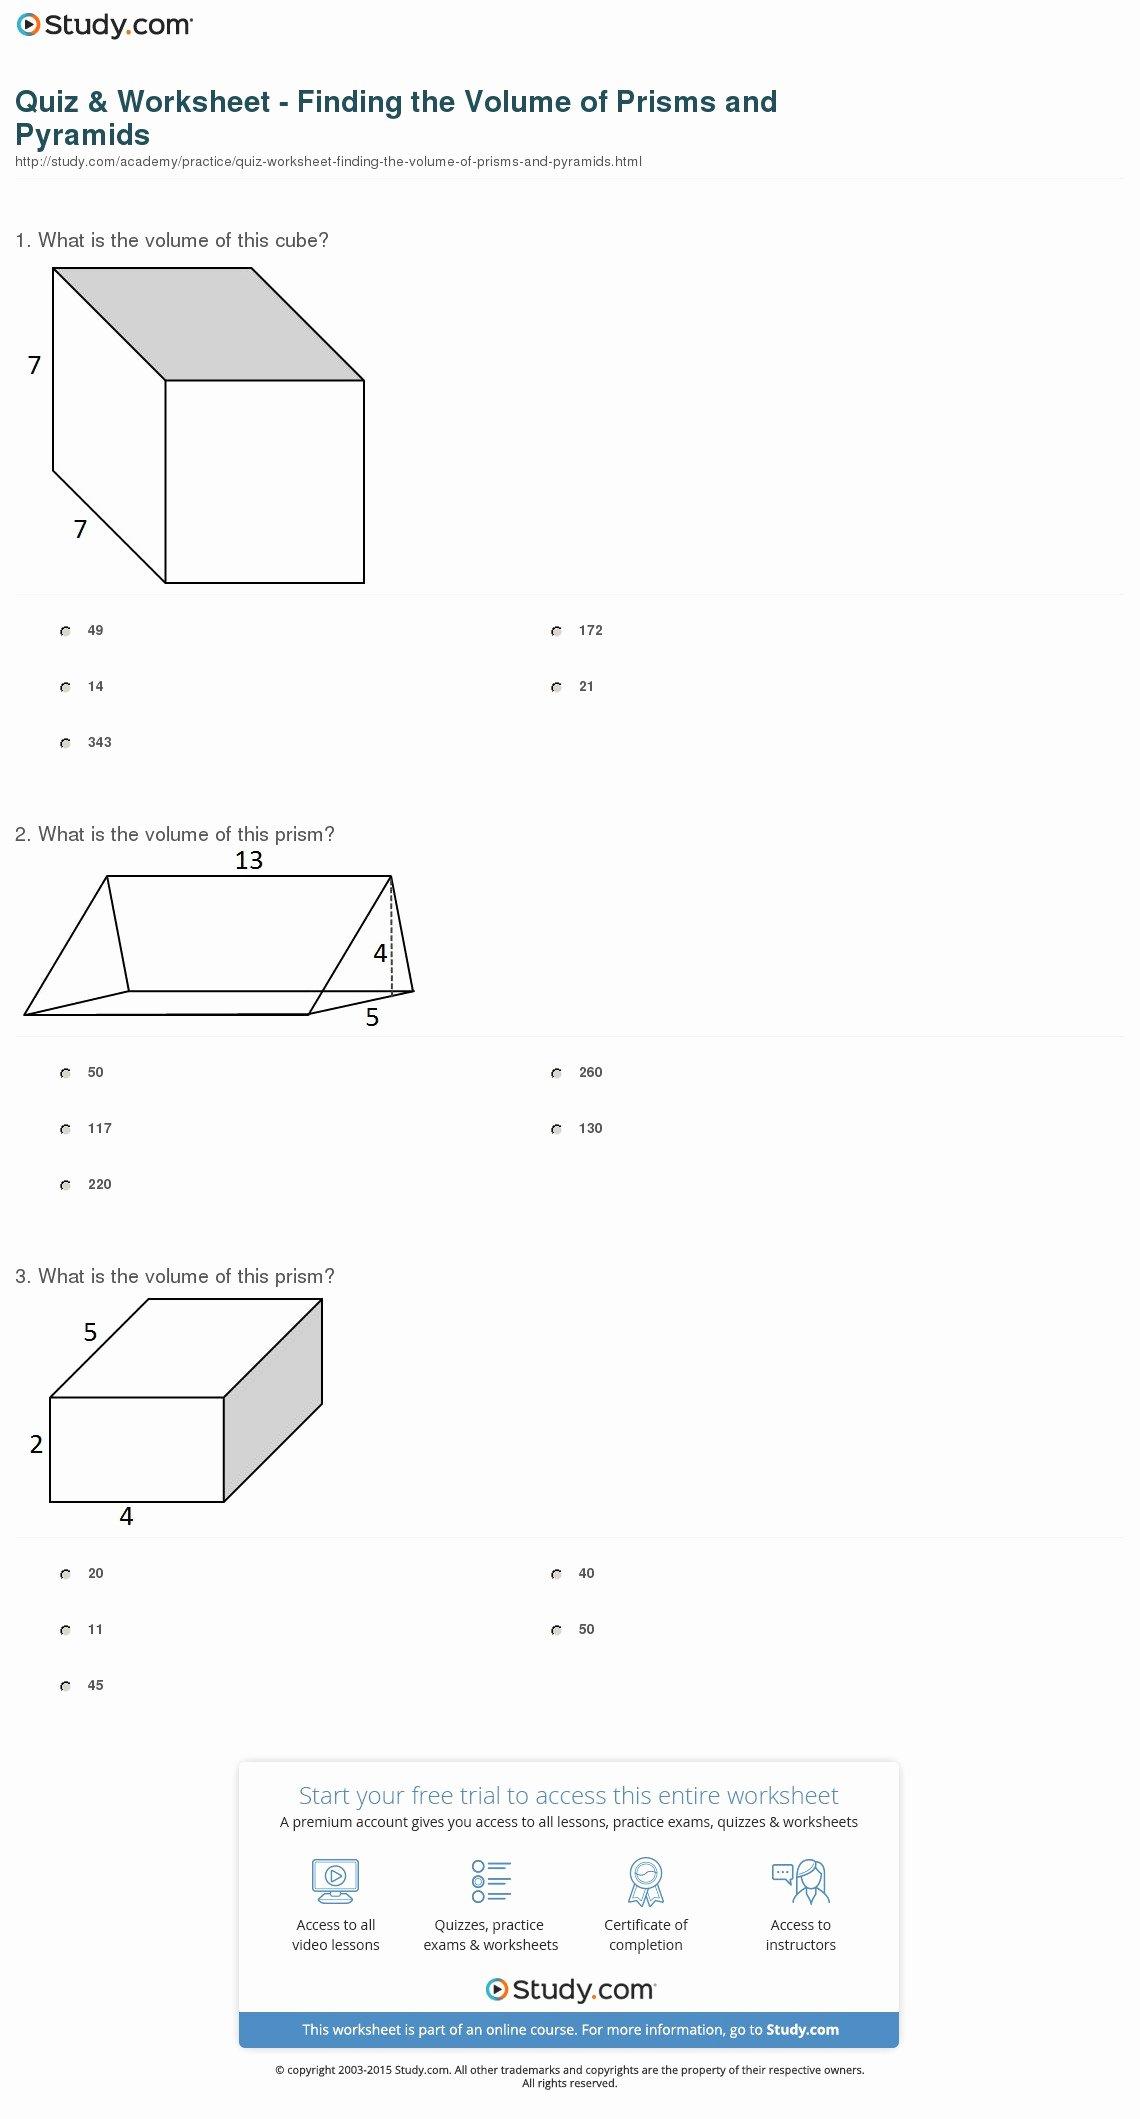 Volume Of Prism Worksheet Unique Quiz & Worksheet Finding the Volume Of Prisms and